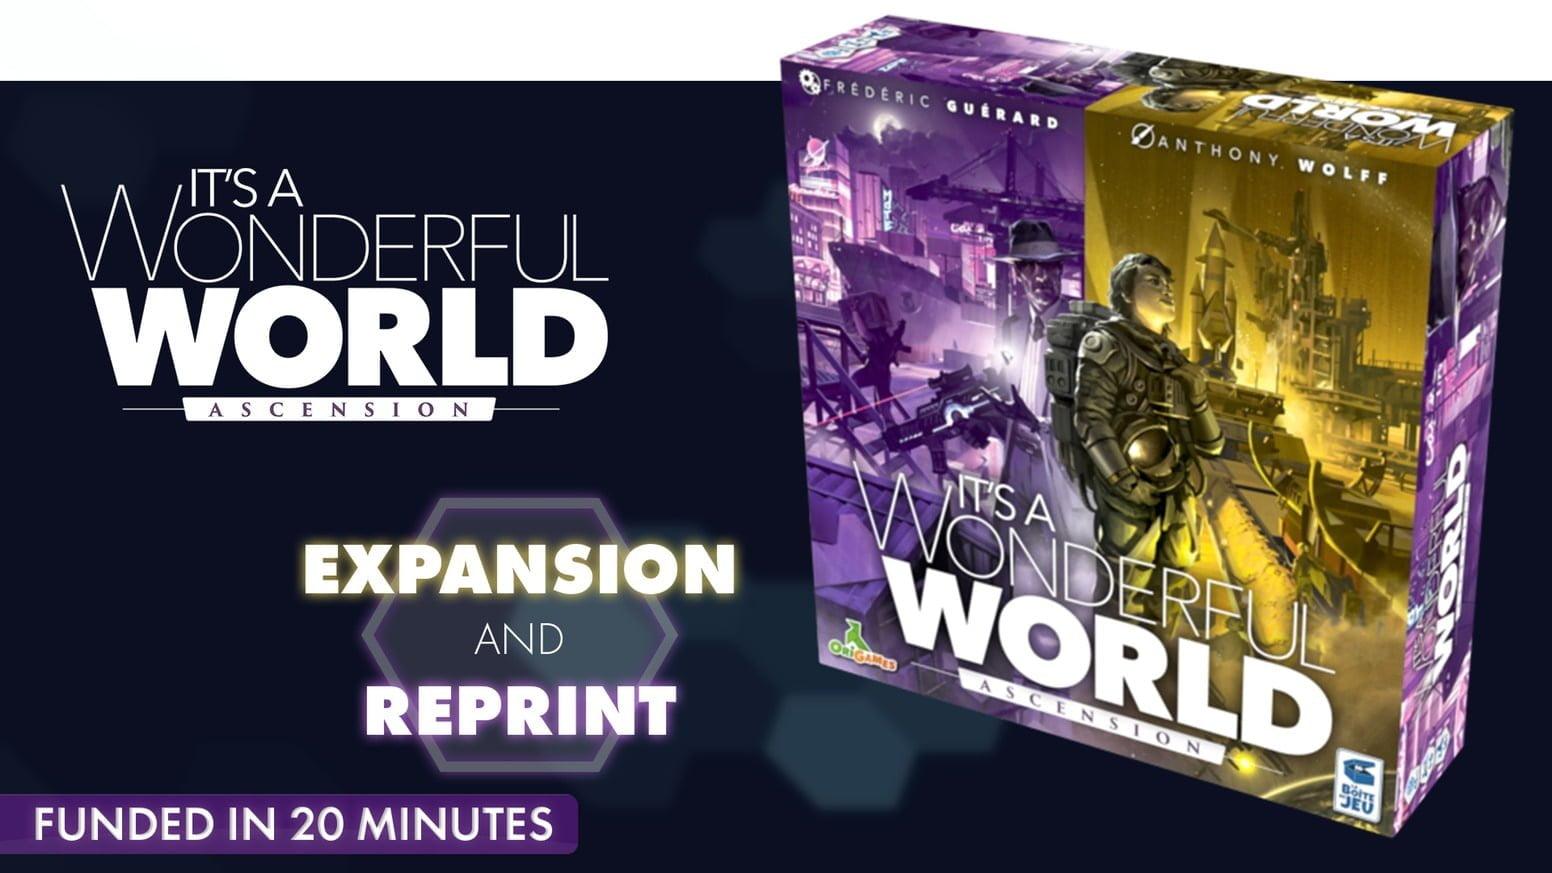 [Kickstarter]: It's a Wonderfull World: Ascension